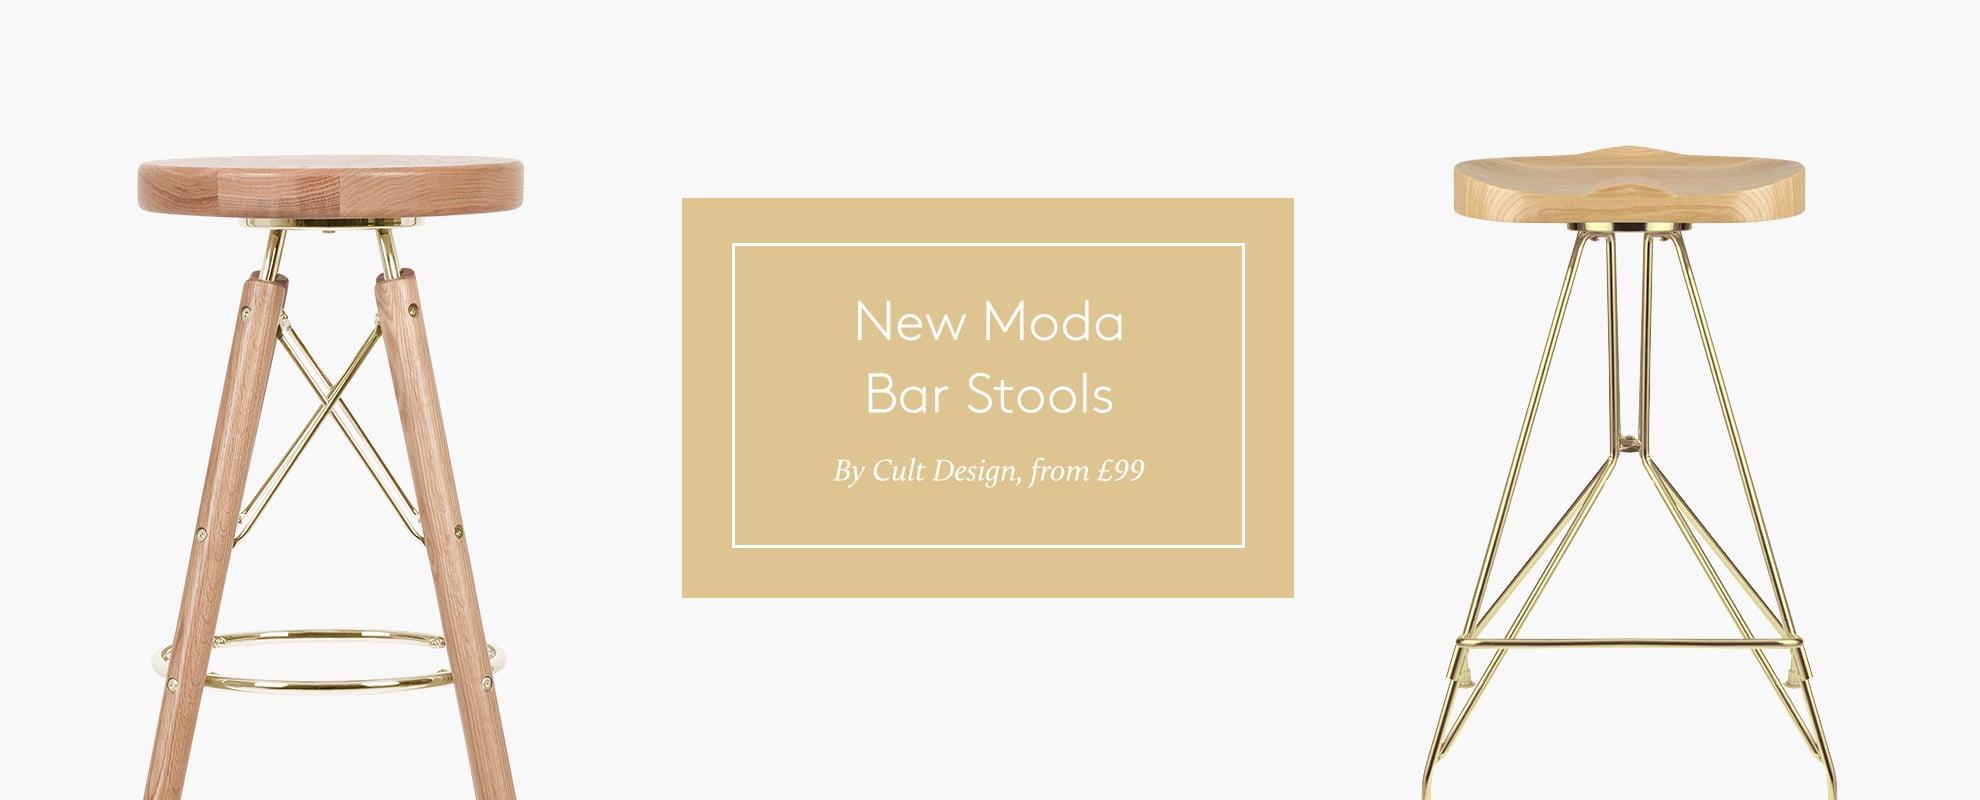 Moda Bar Stools